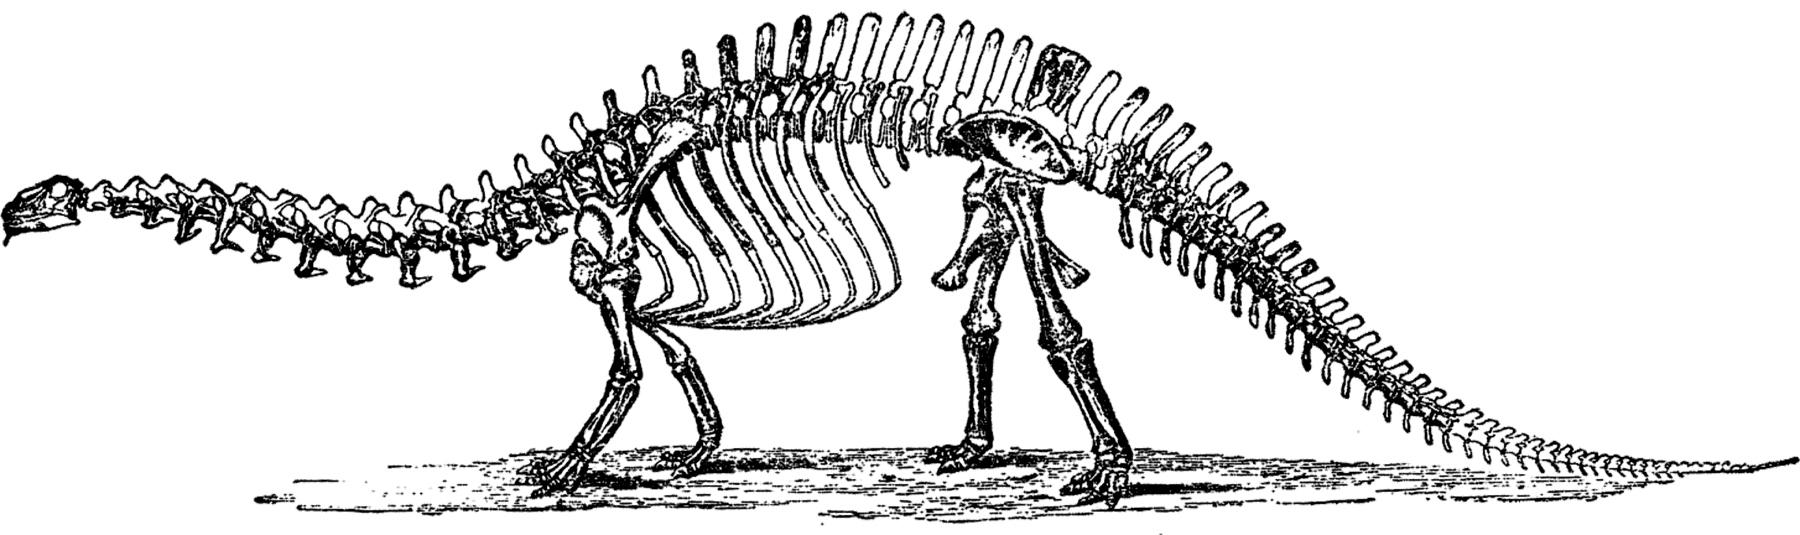 Vintage Dinosaur Clip Art! - The Graphics Fairy